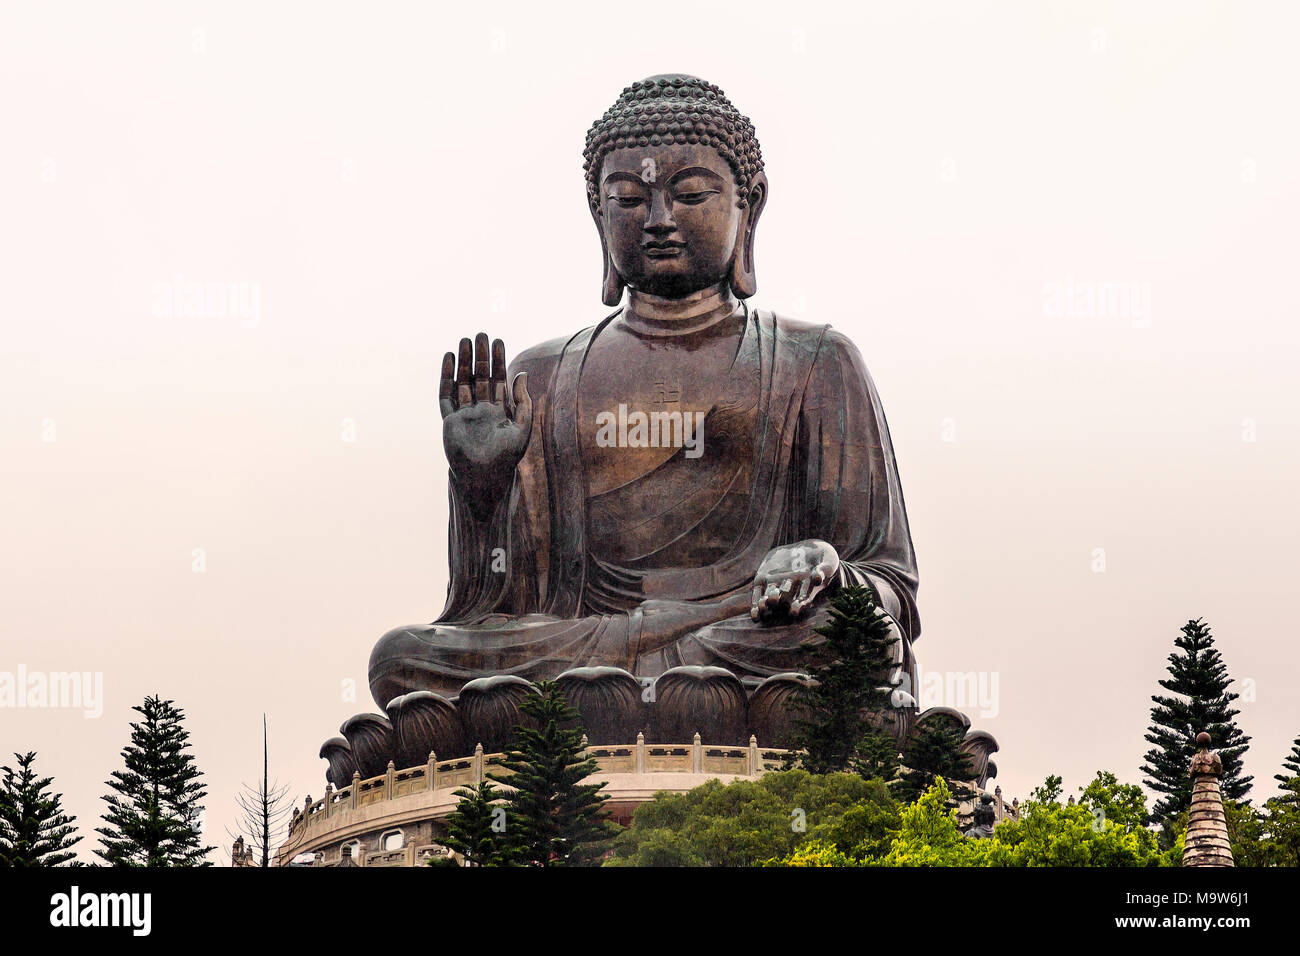 Tian Tan Buddha is a large bronze statue of Buddha Shakyamuni, It is located at Ngong Ping, Lantau Island, one of the Hong Kong Islands. - Stock Image